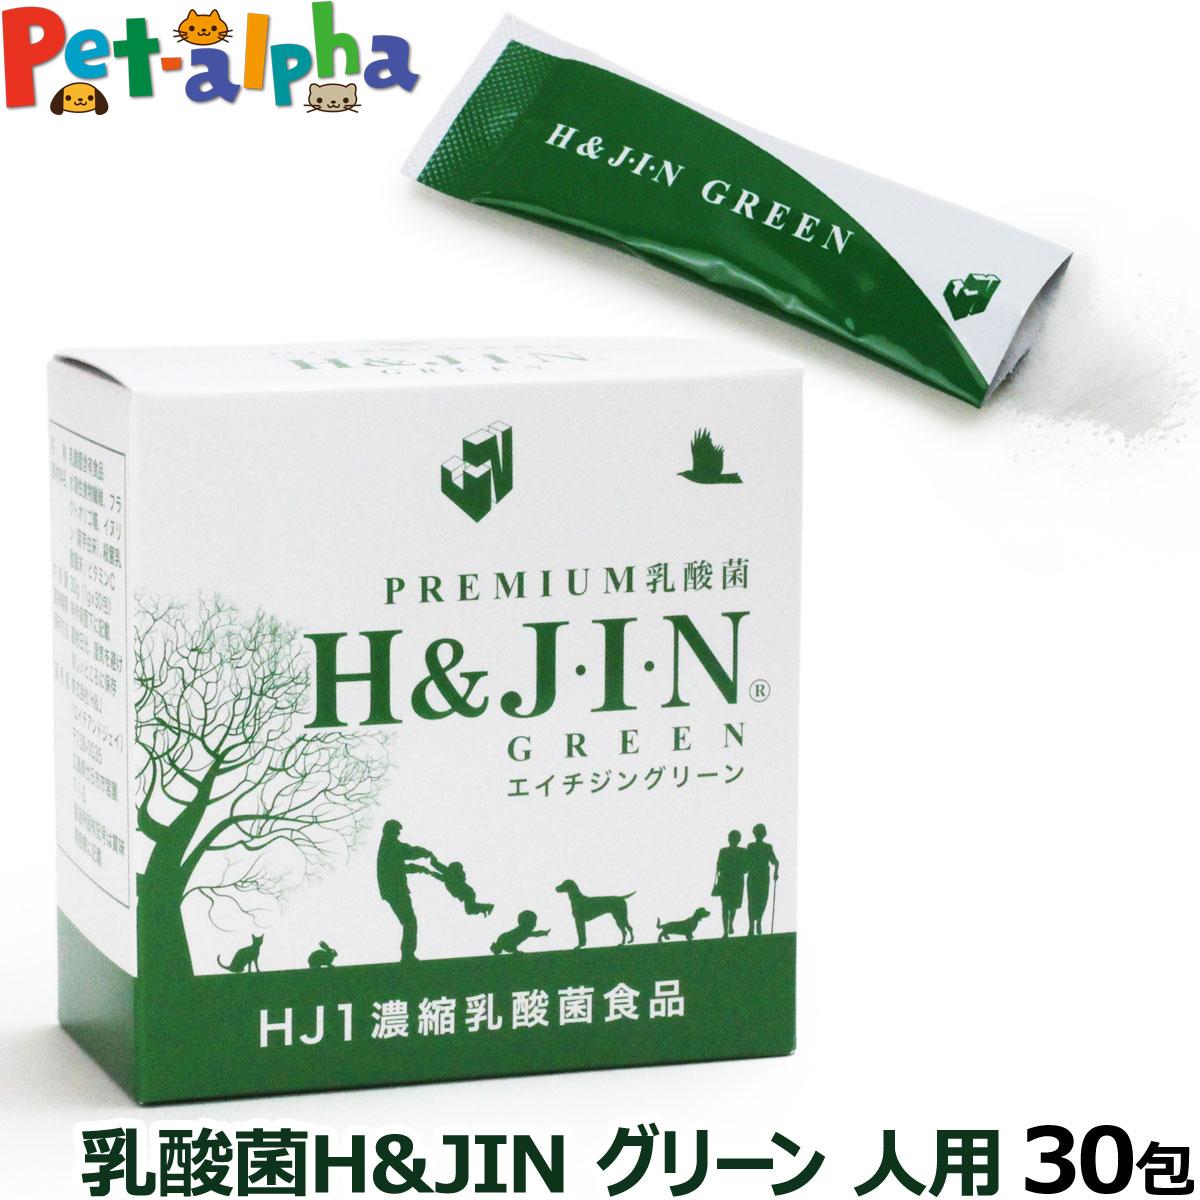 HJ1乳酸菌を配合 Premium乳酸菌HJIN グリーン 再入荷 予約販売 人用 30包 乳酸菌 サプリ 『1年保証』 腸活 エイチジン 人間用 サプリメント 高品質乳酸菌 快腸 快便